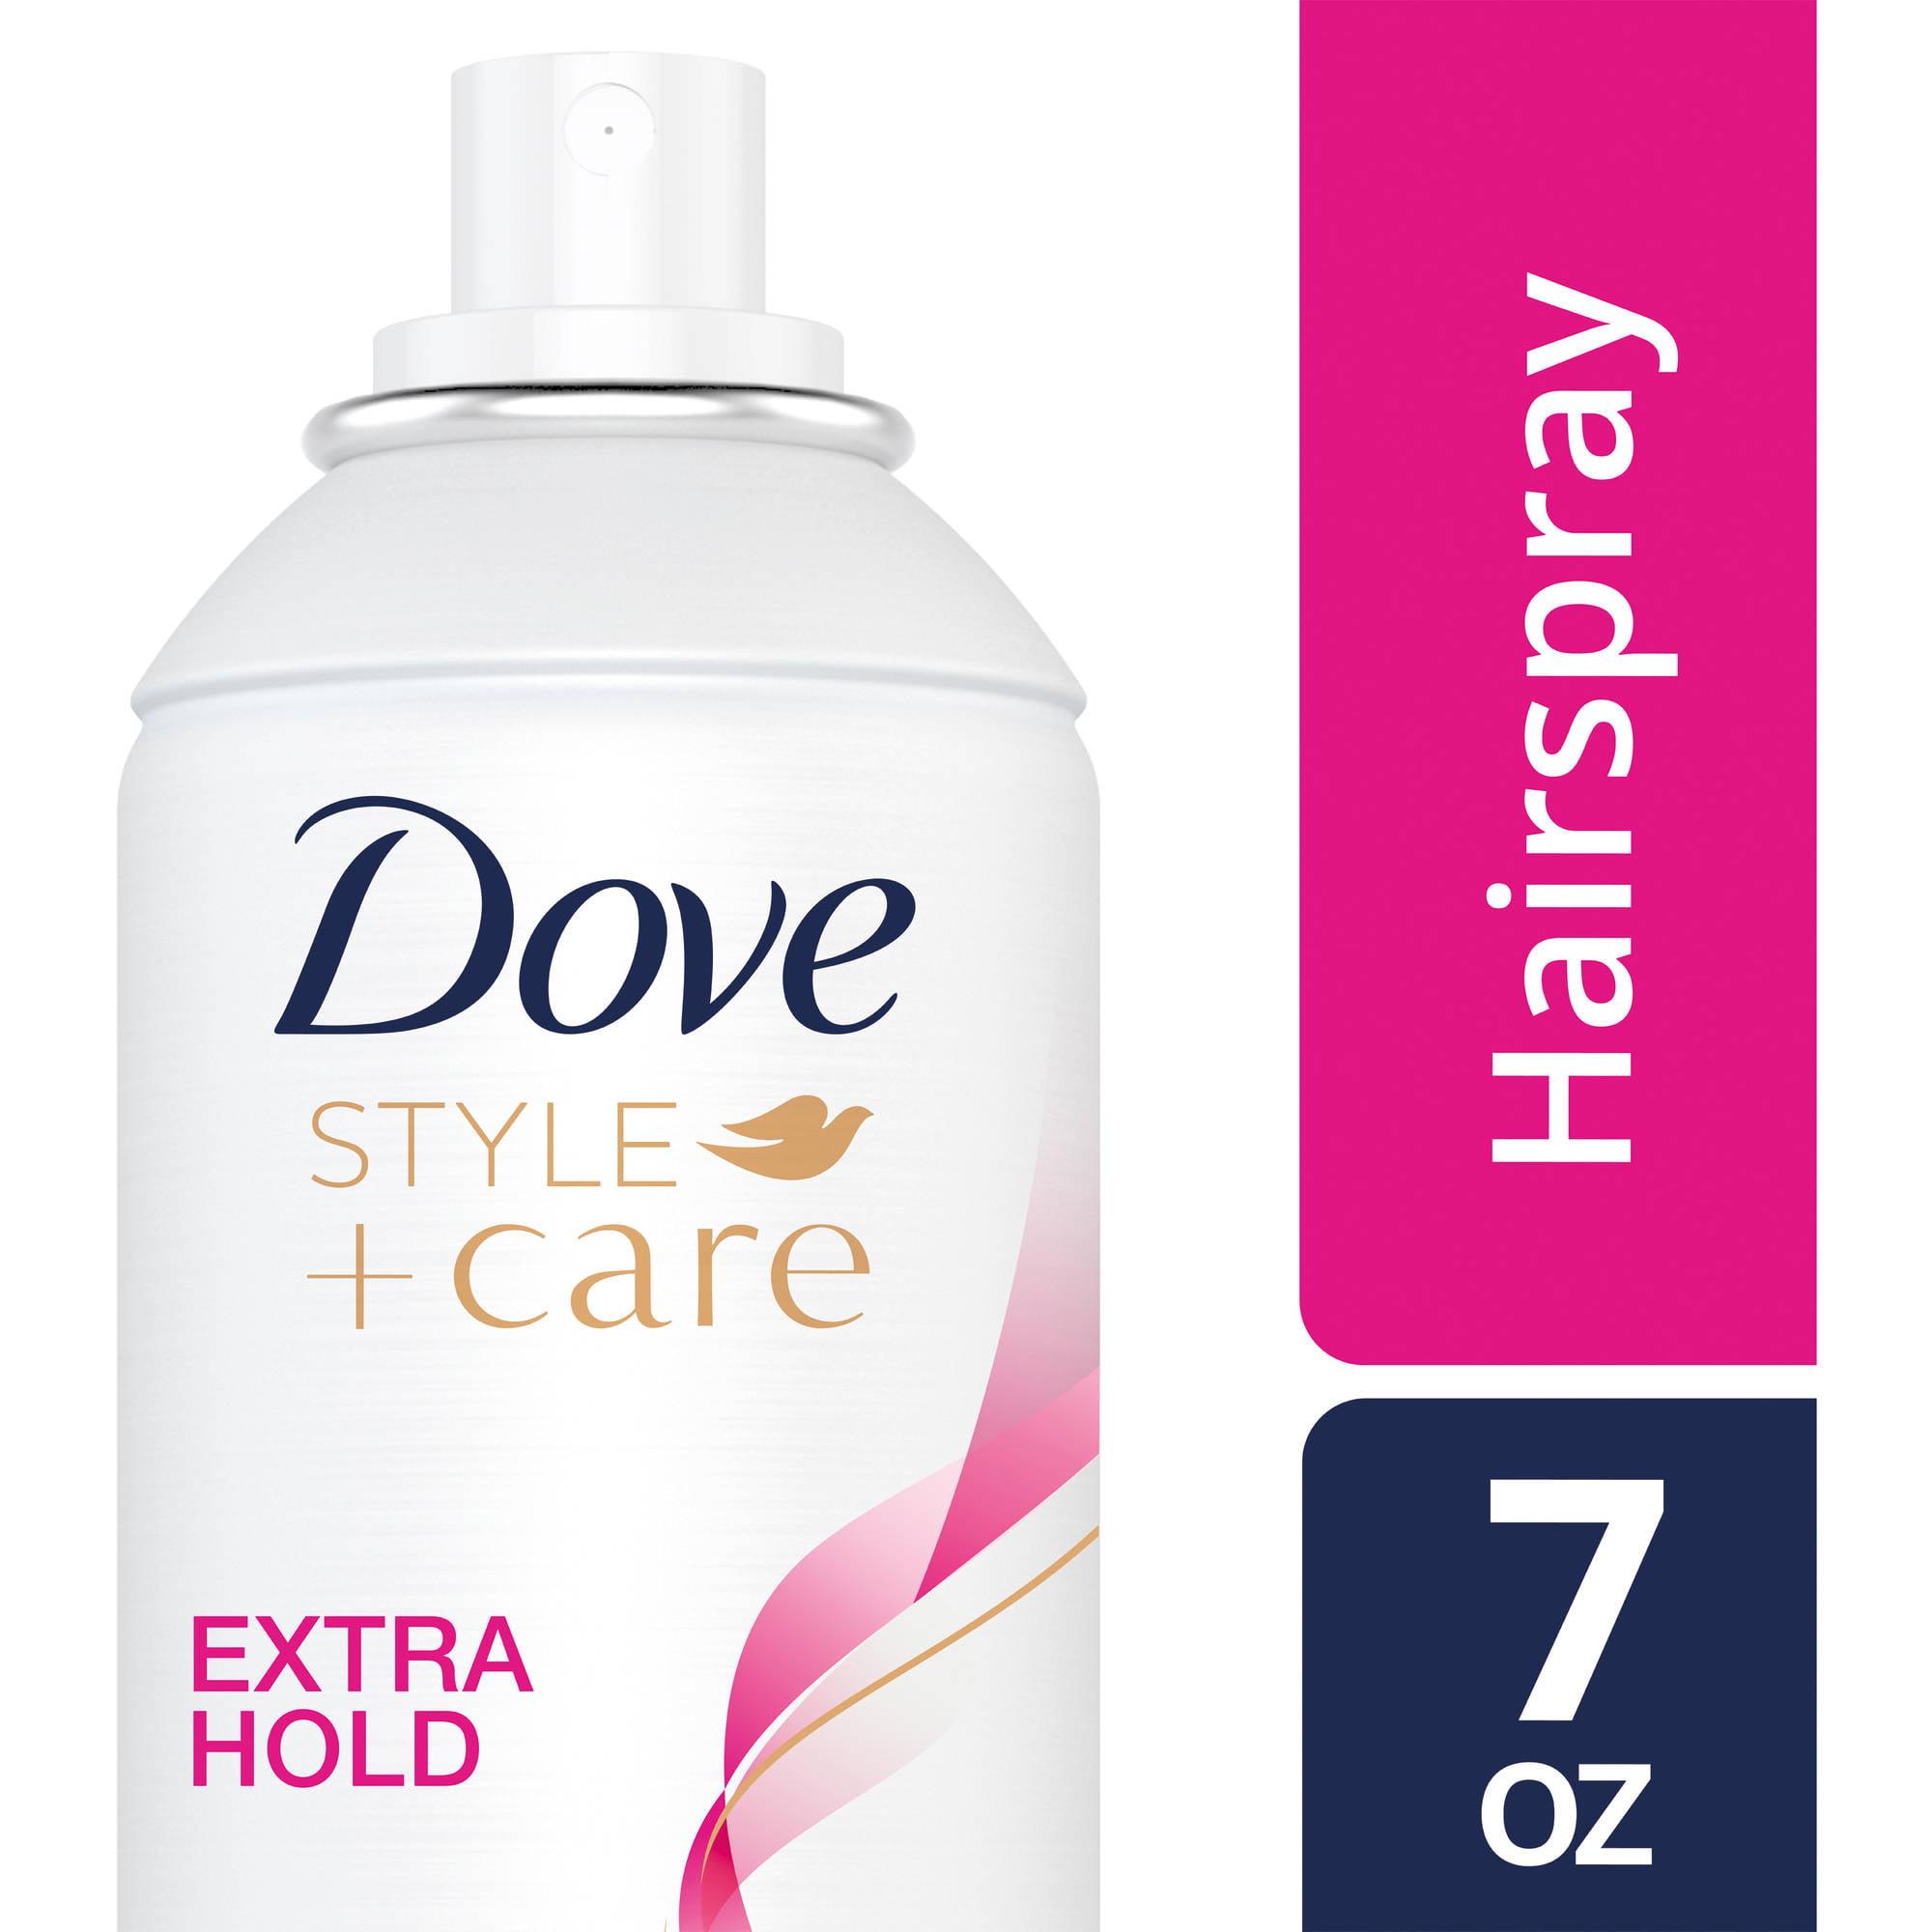 Dove Strength and Shine Extra Hold Hairspray, 7 oz